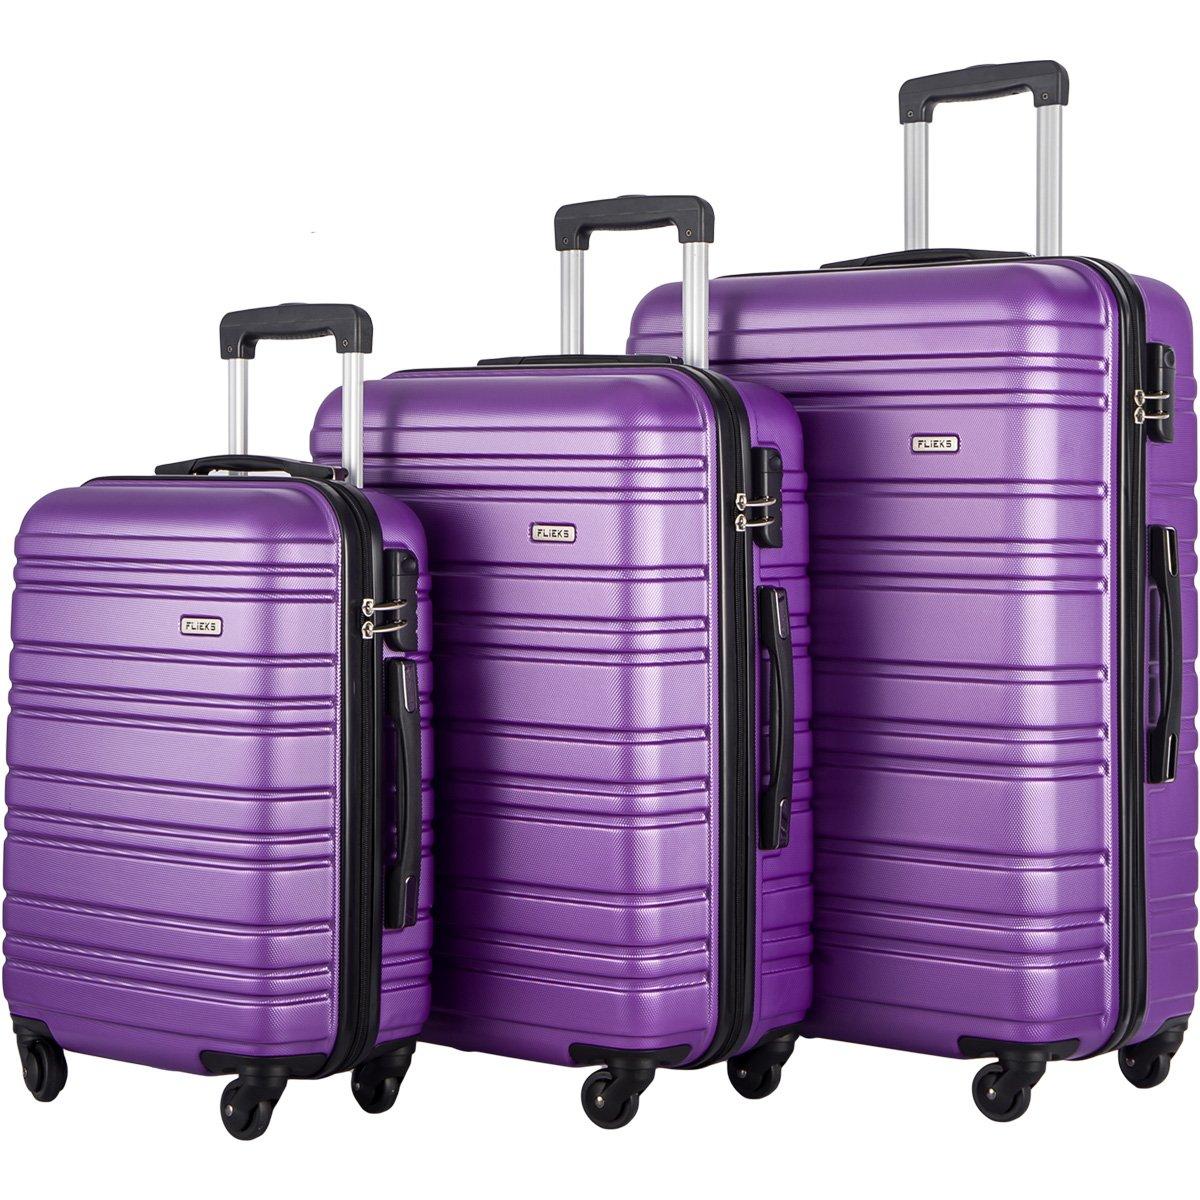 FLIEKS Luggages 3 Piece Luggage Set Spinner Suitcase (Purple)